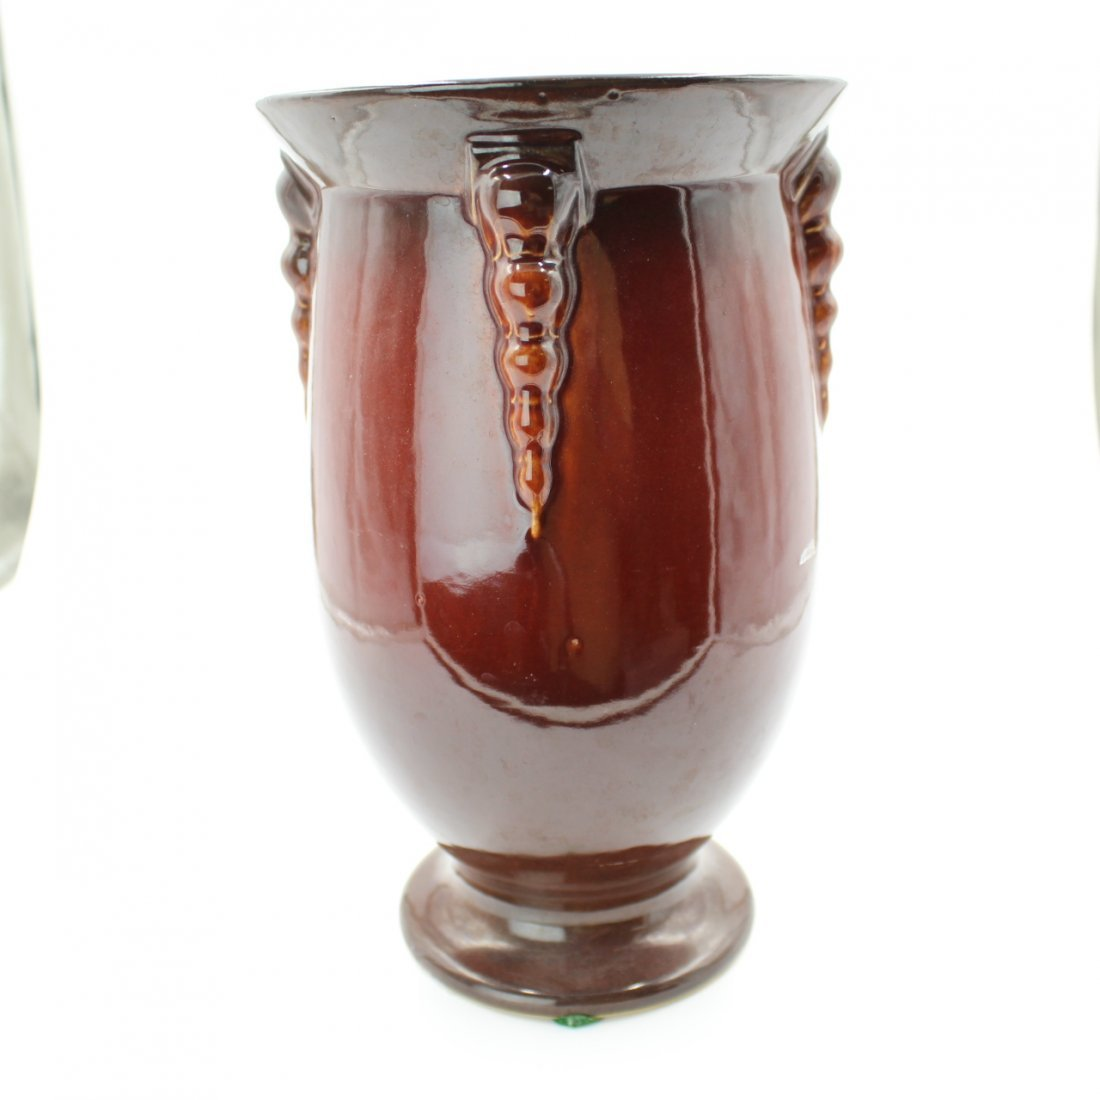 C. 1934 Roseville Topeo Red Vase #663-10